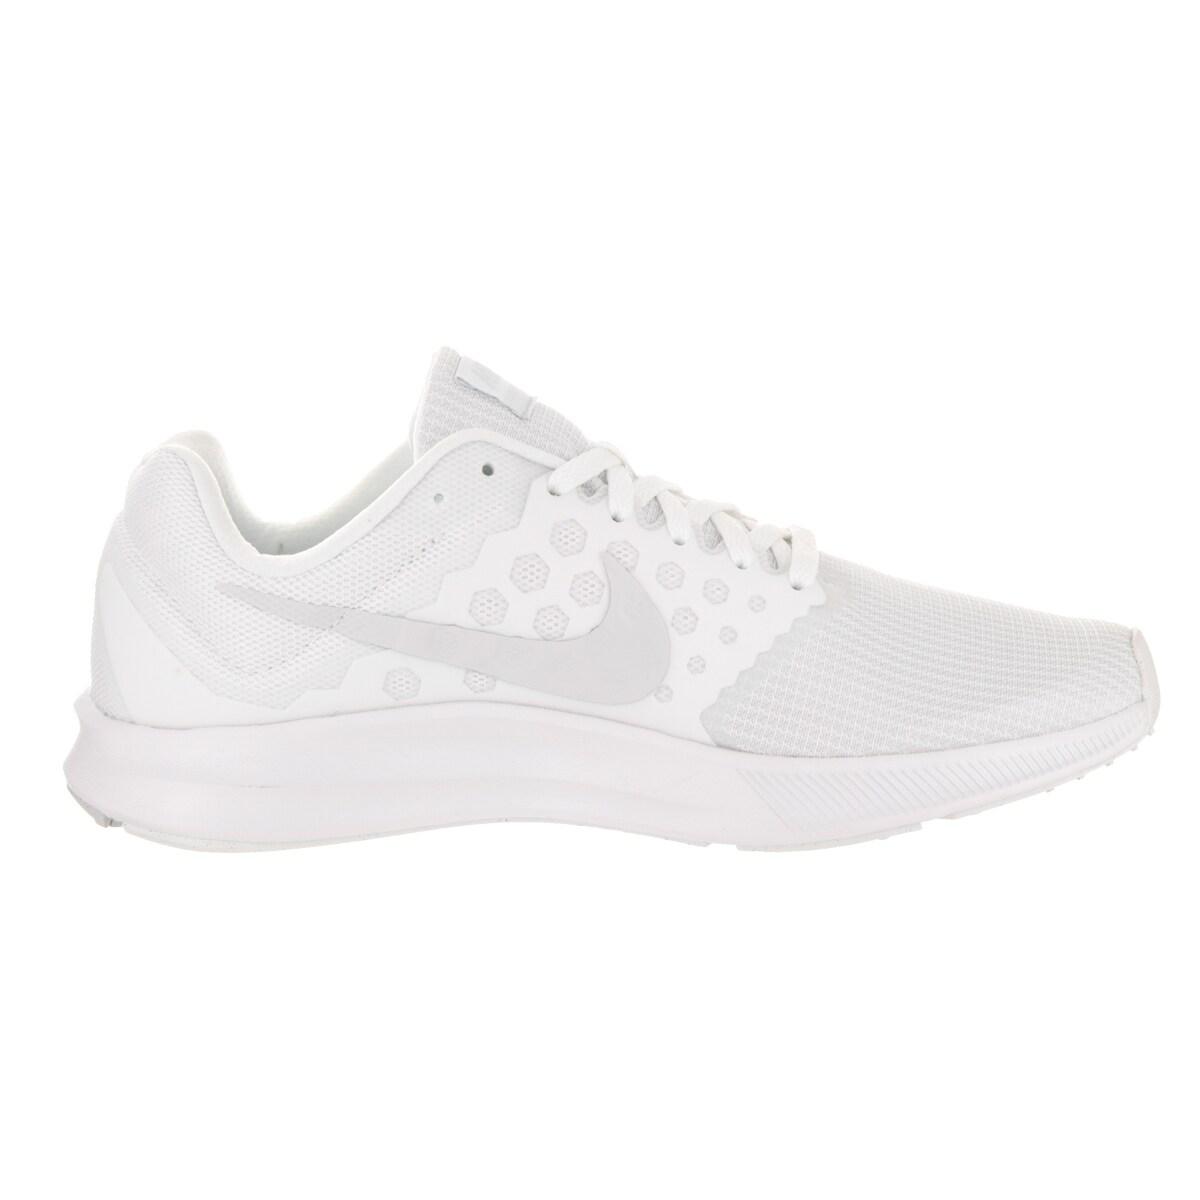 5df1719c265 Shop Nike Women s Downshifter 7 Running Shoes - Free Shipping Today -  Overstock - 14972399